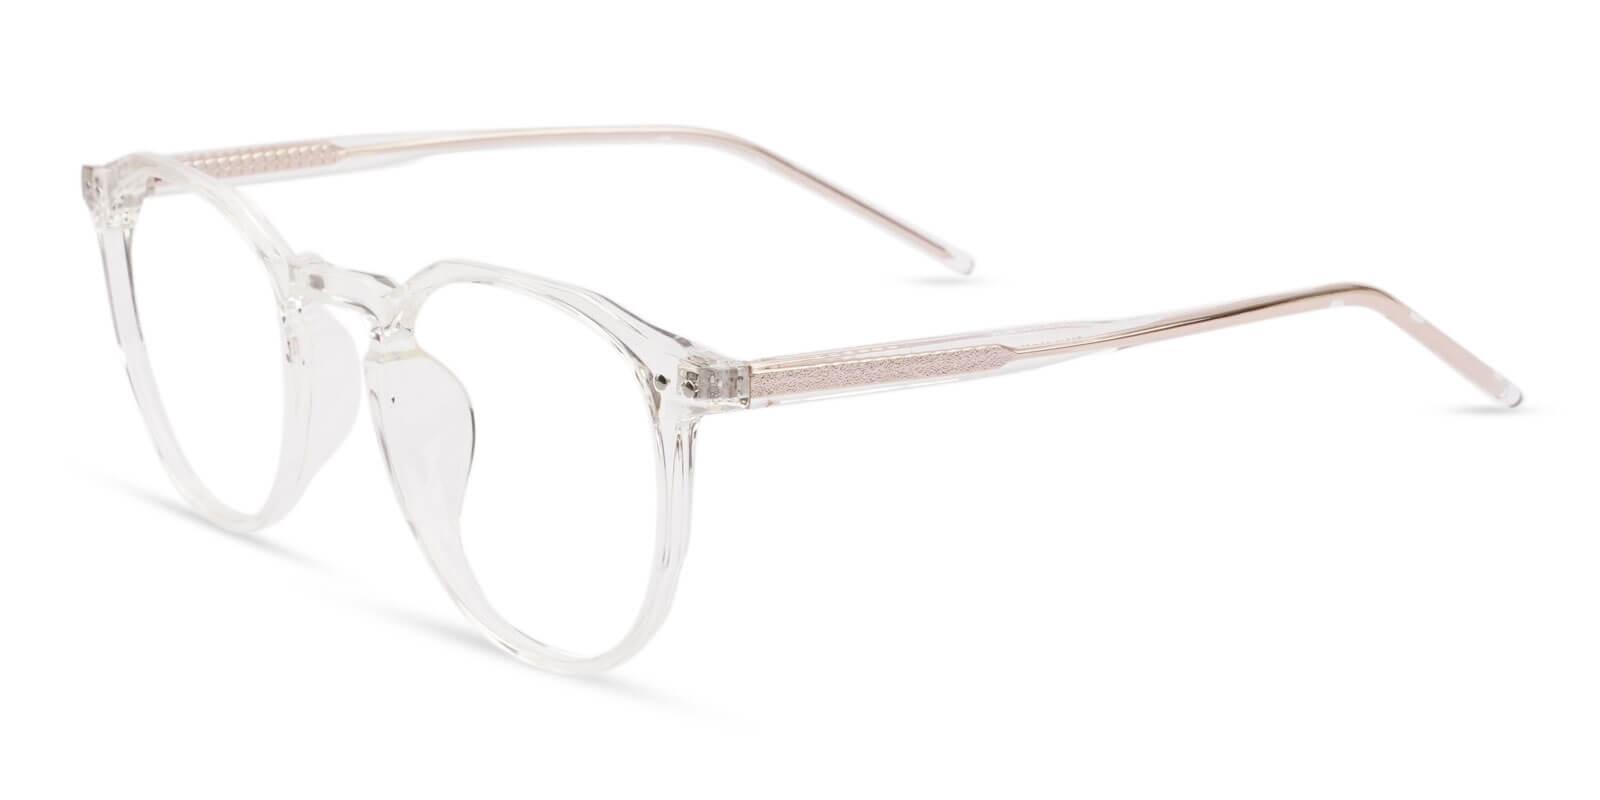 Mariner Translucent Acetate Eyeglasses , SpringHinges , UniversalBridgeFit Frames from ABBE Glasses